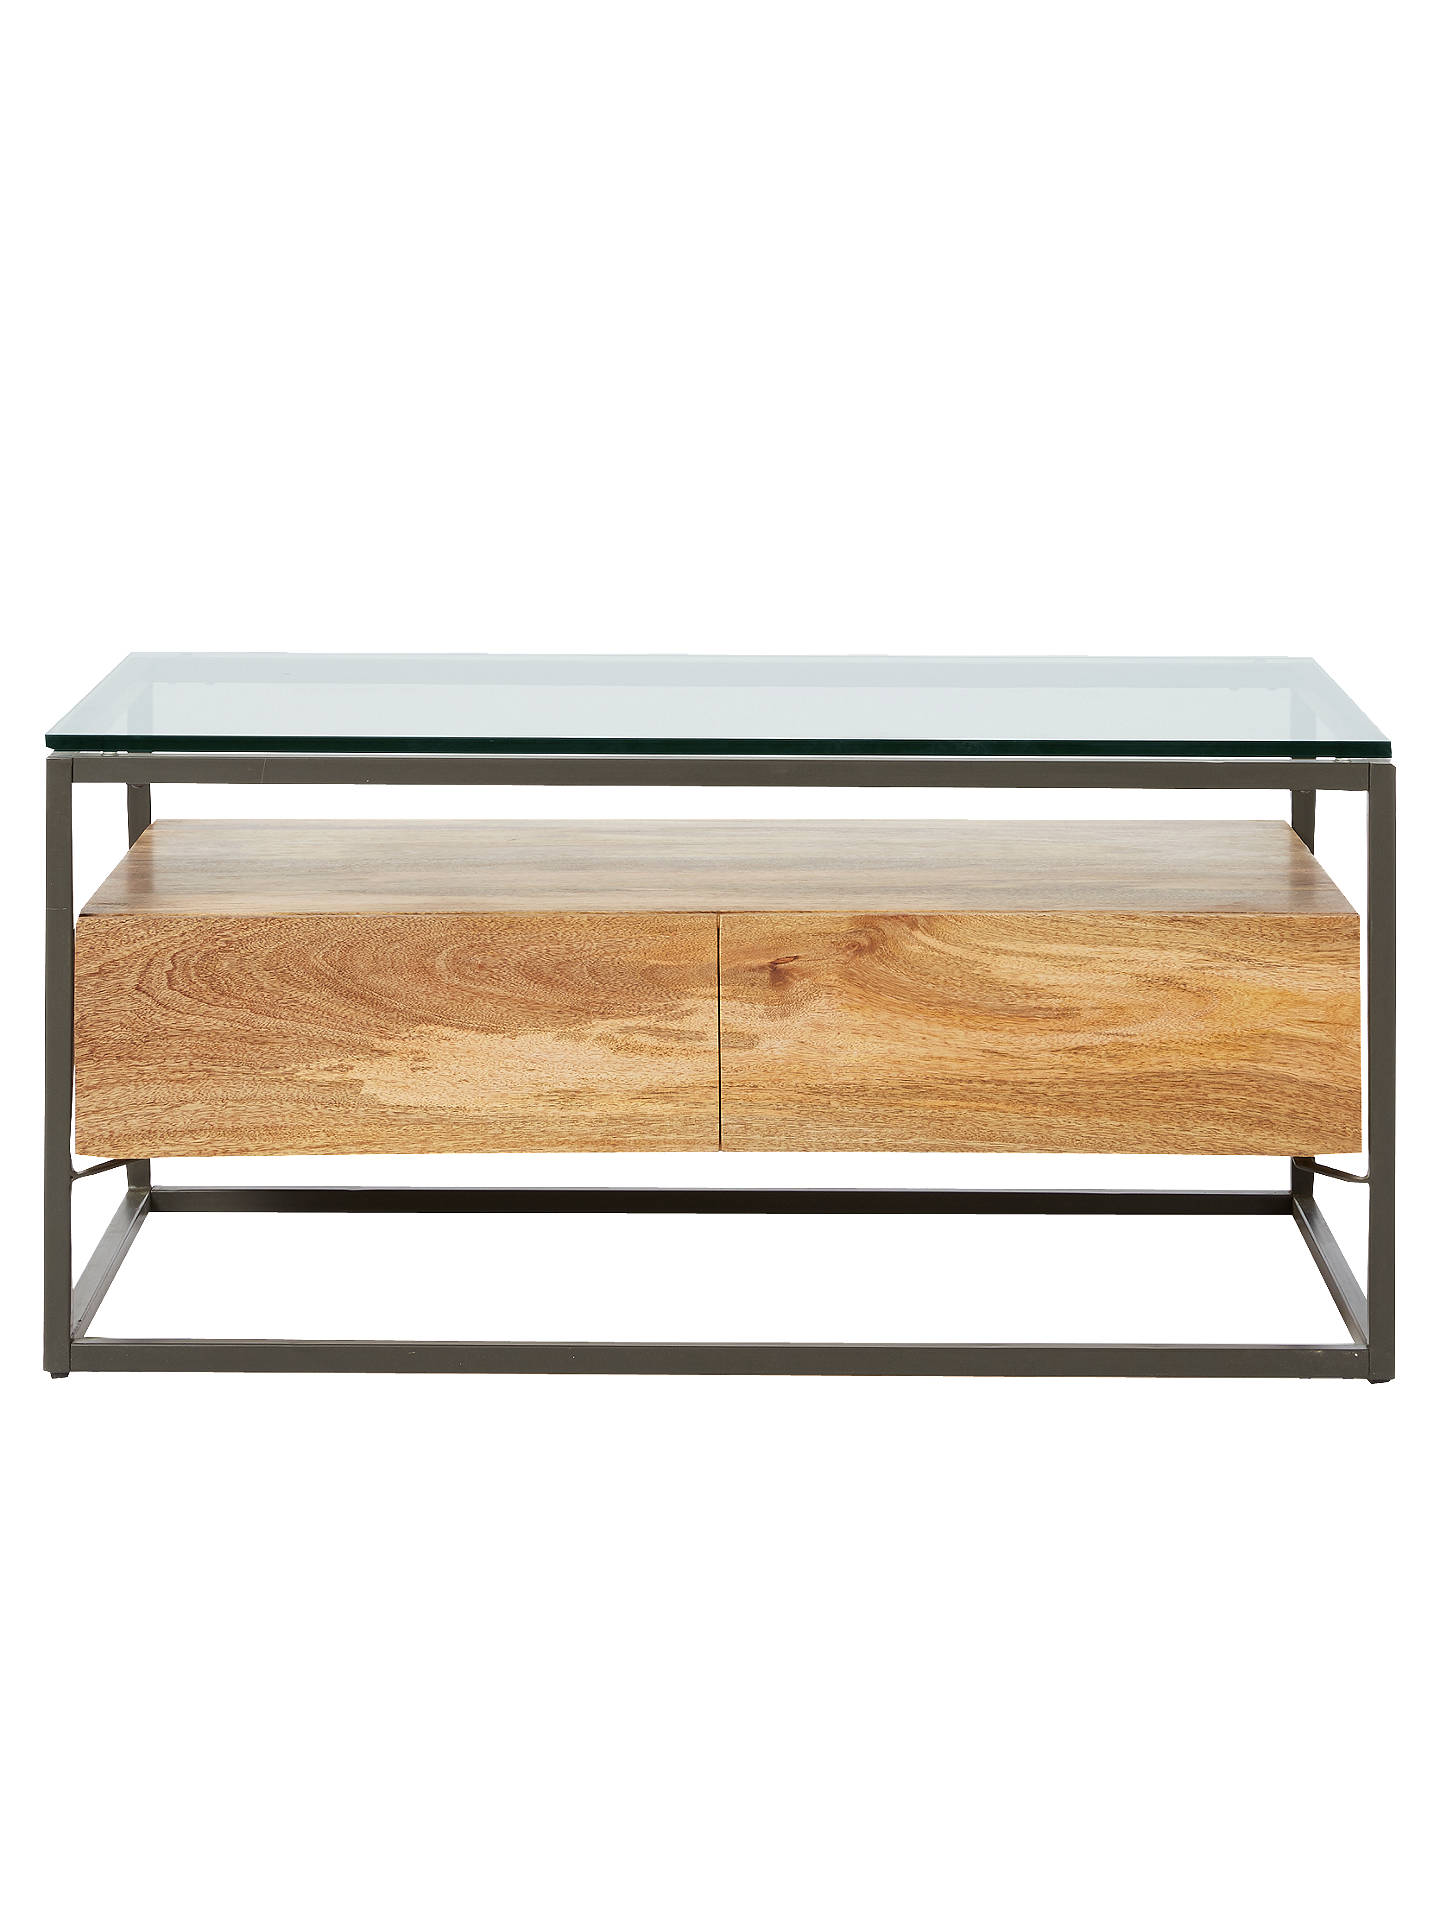 West Elm Industrial Storage Box Frame Coffee Table At John Lewis